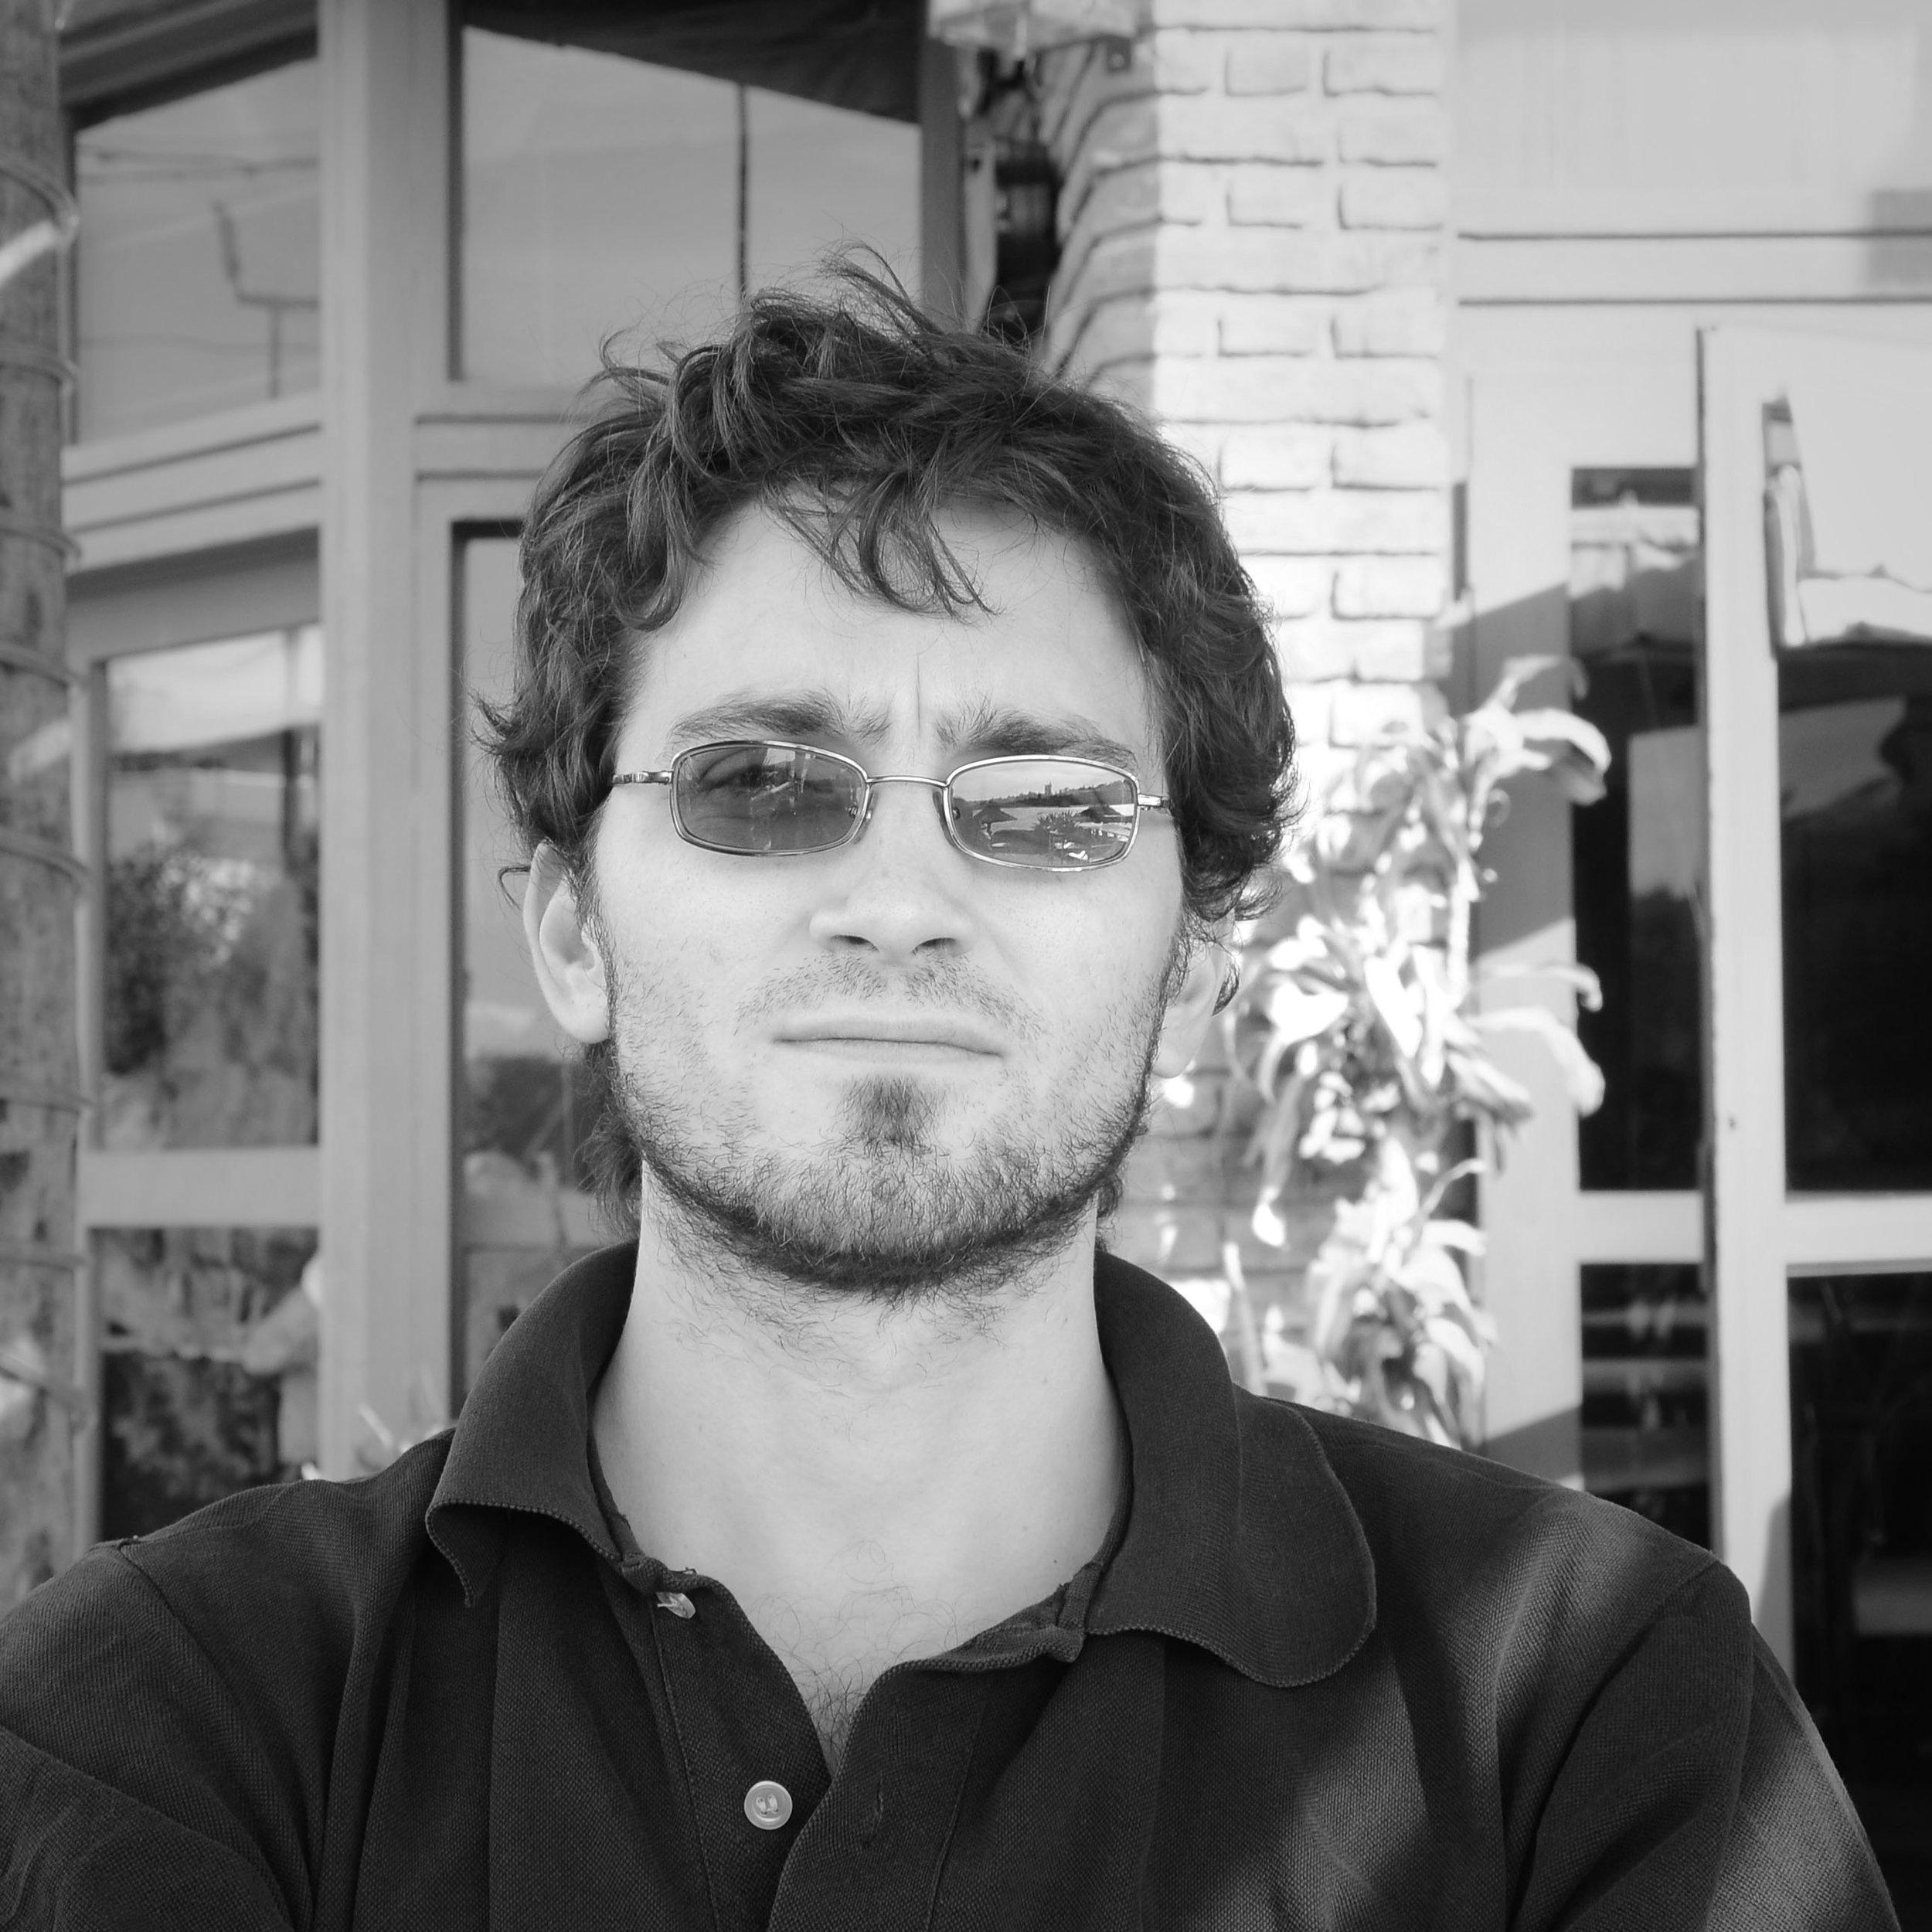 Lucas Zallio, Software Engineer